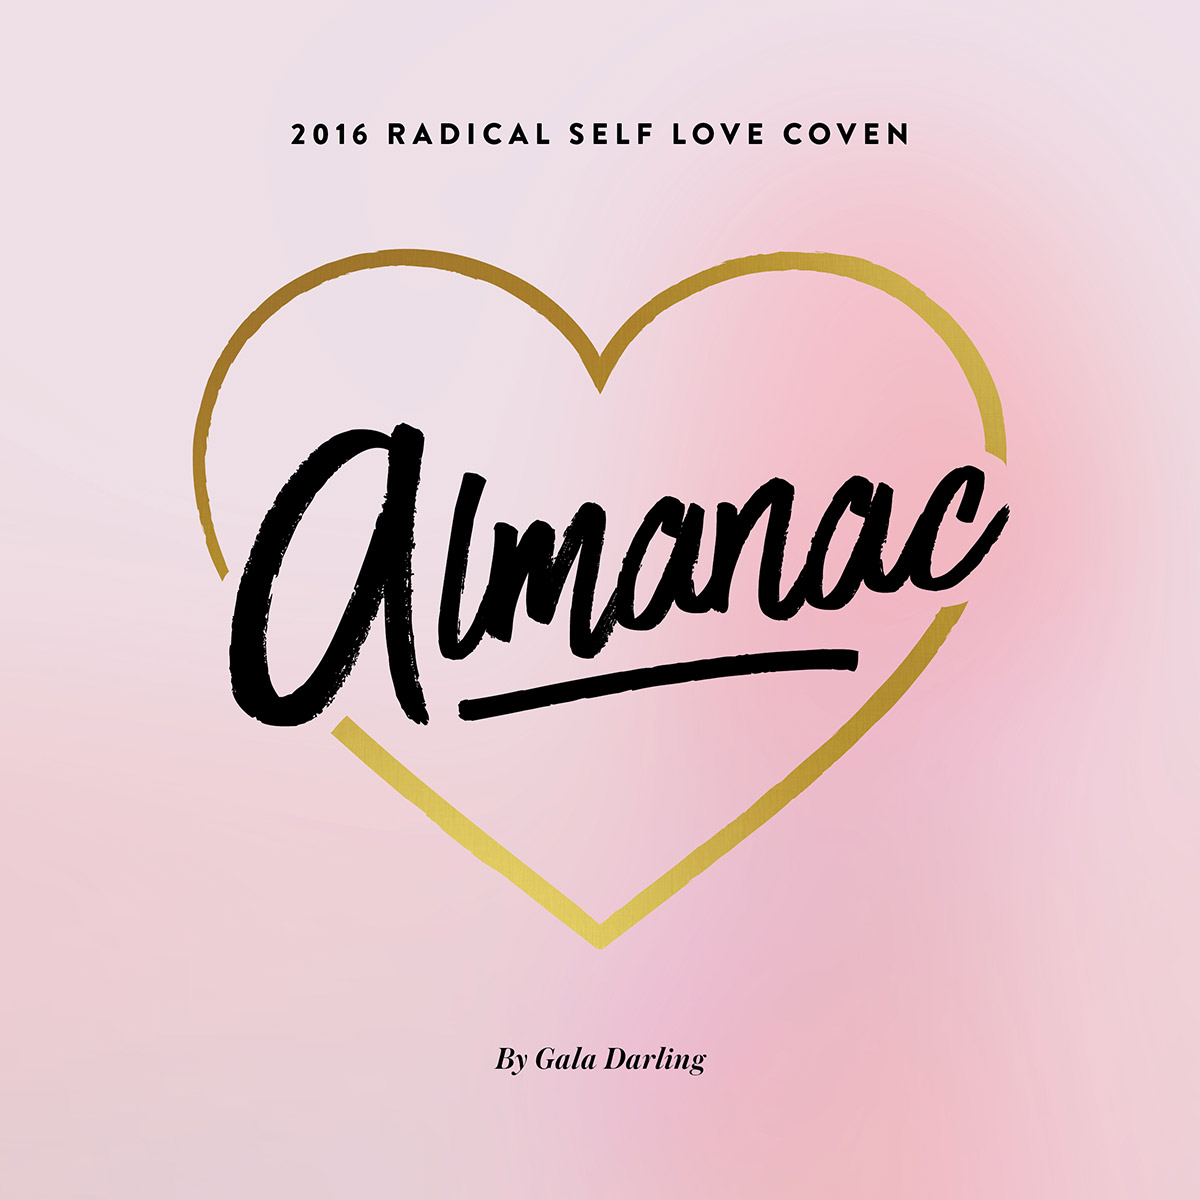 Branch | Gala Darling Radical Self Love Coven Almanac